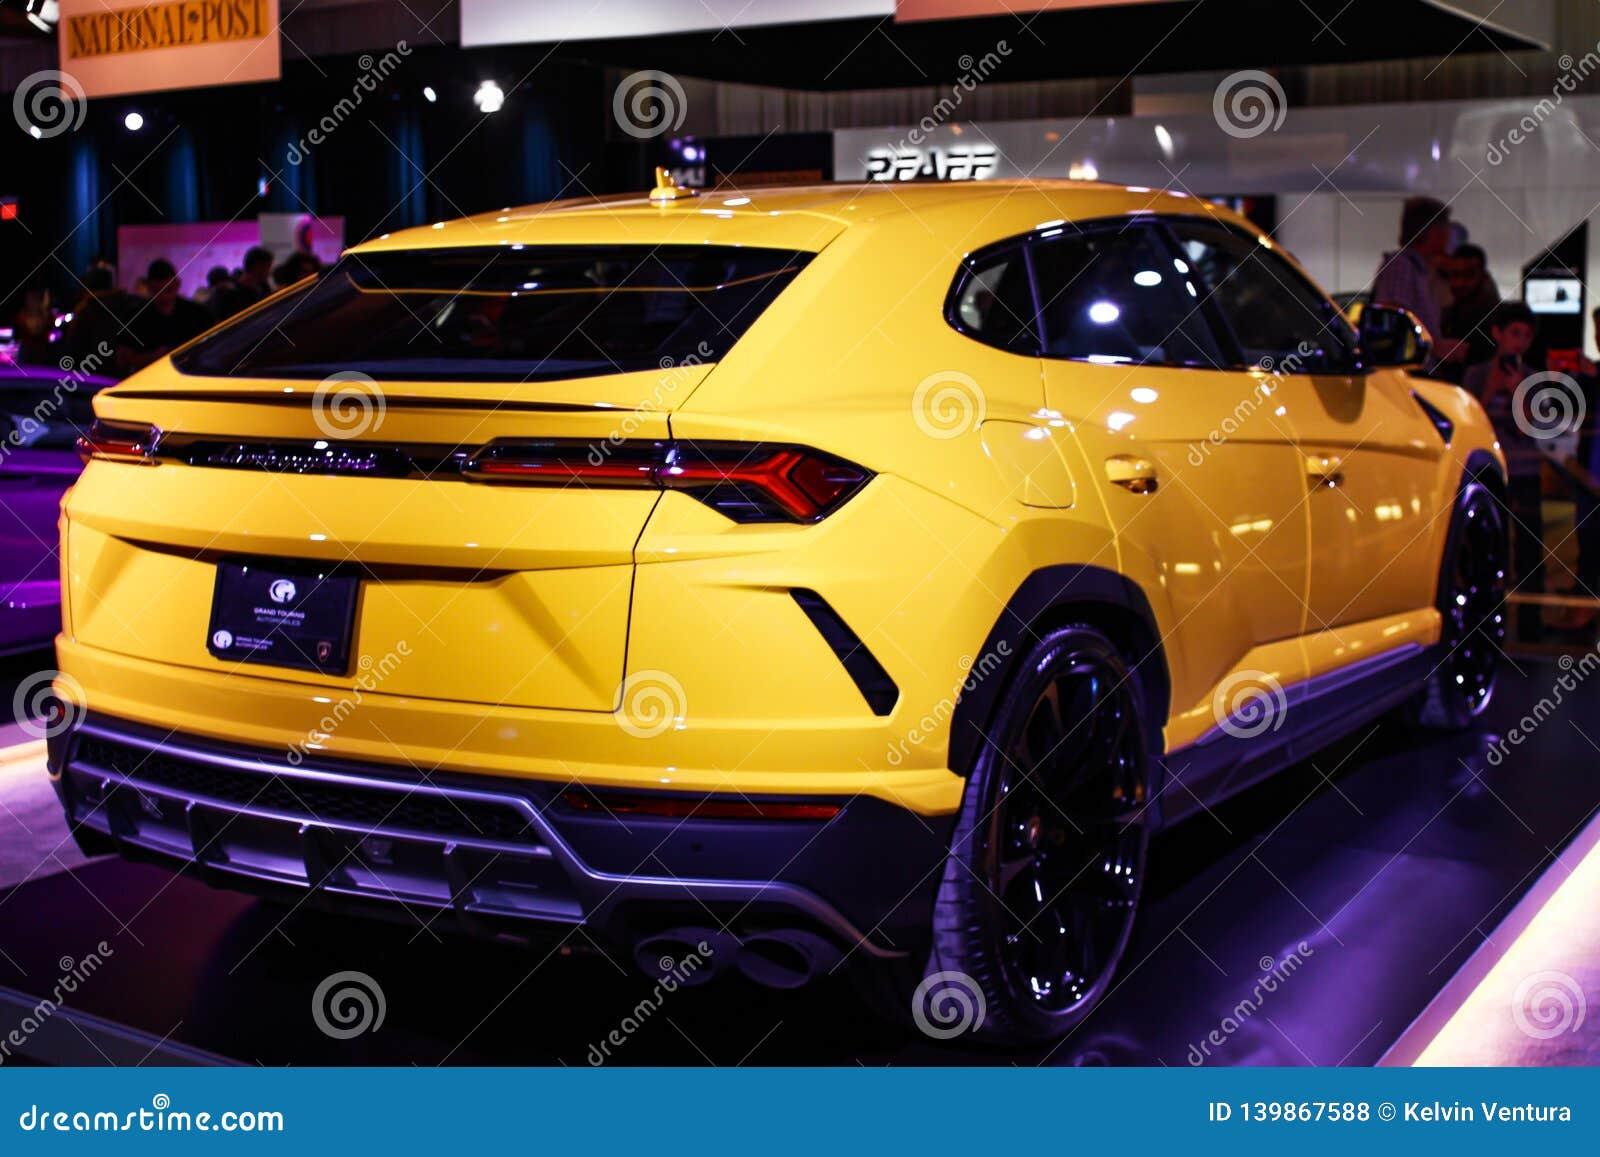 Yellow Lamborghini Family On Display As Well As A Black Bentley